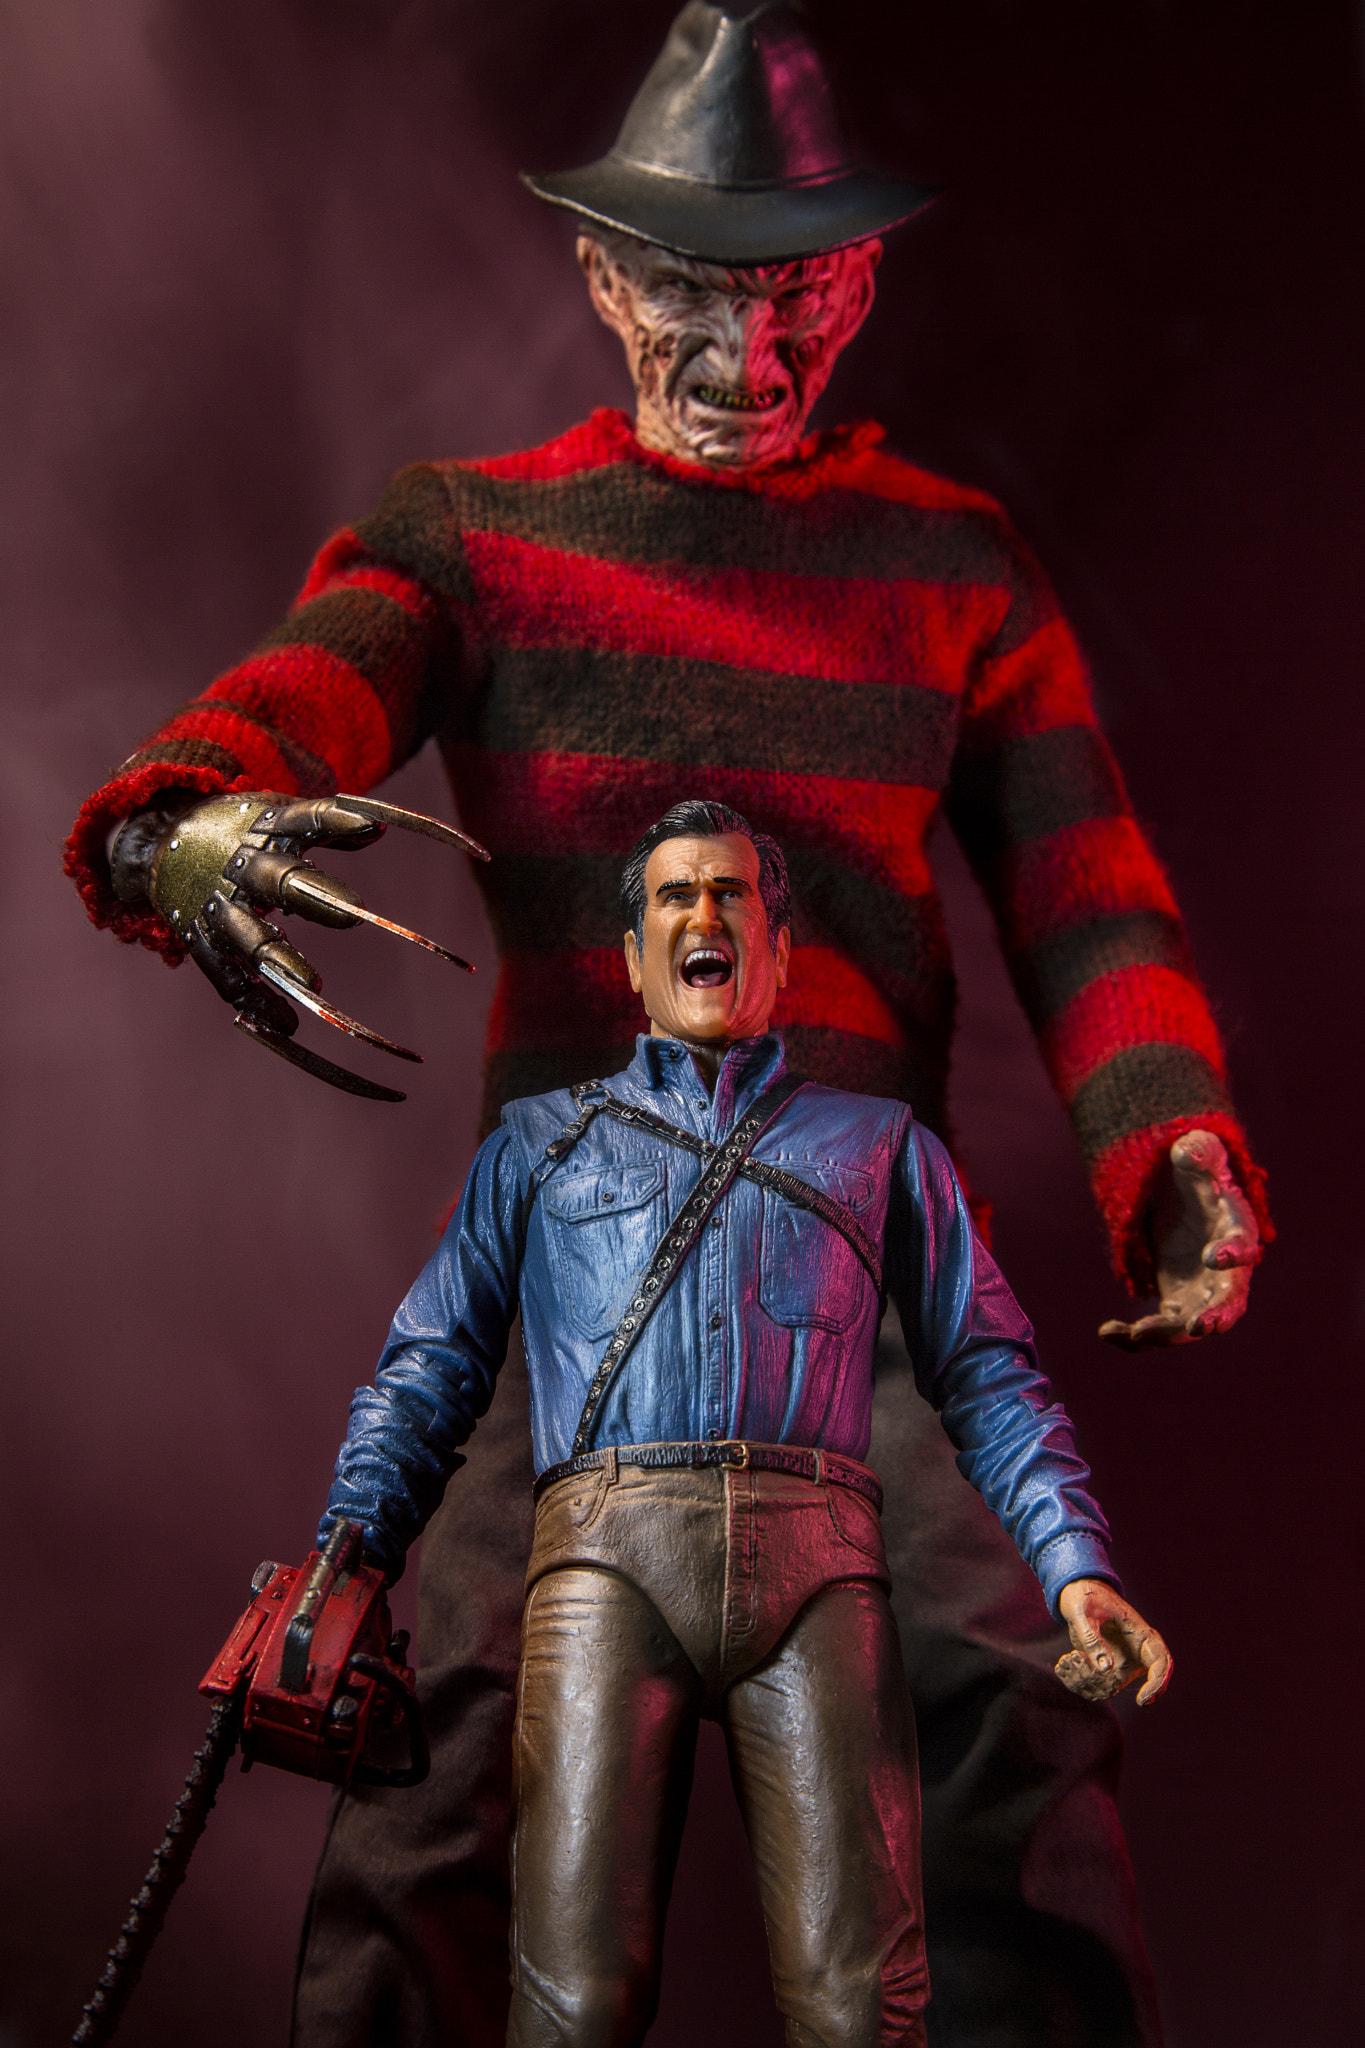 Wallpaper Toys Action Figures Freddy Krueger Ash Fictional